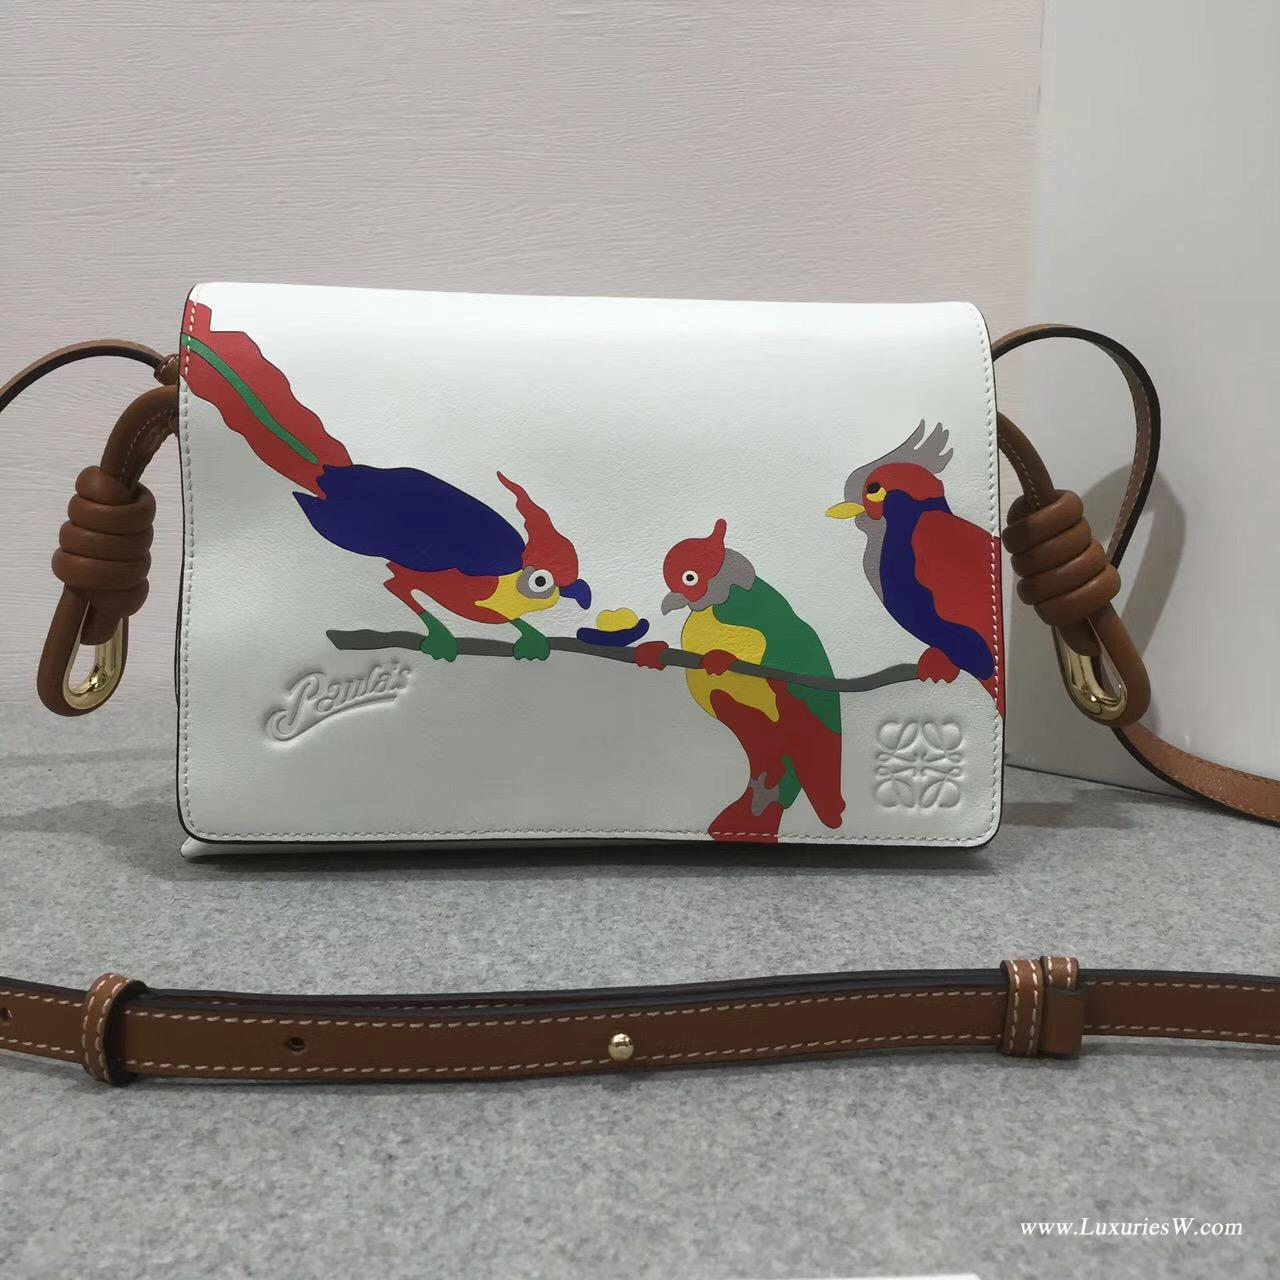 Loewe Flamenco  flap Paula's Ibl  s bag白色拼色小牛皮 印鸚鵡圖案